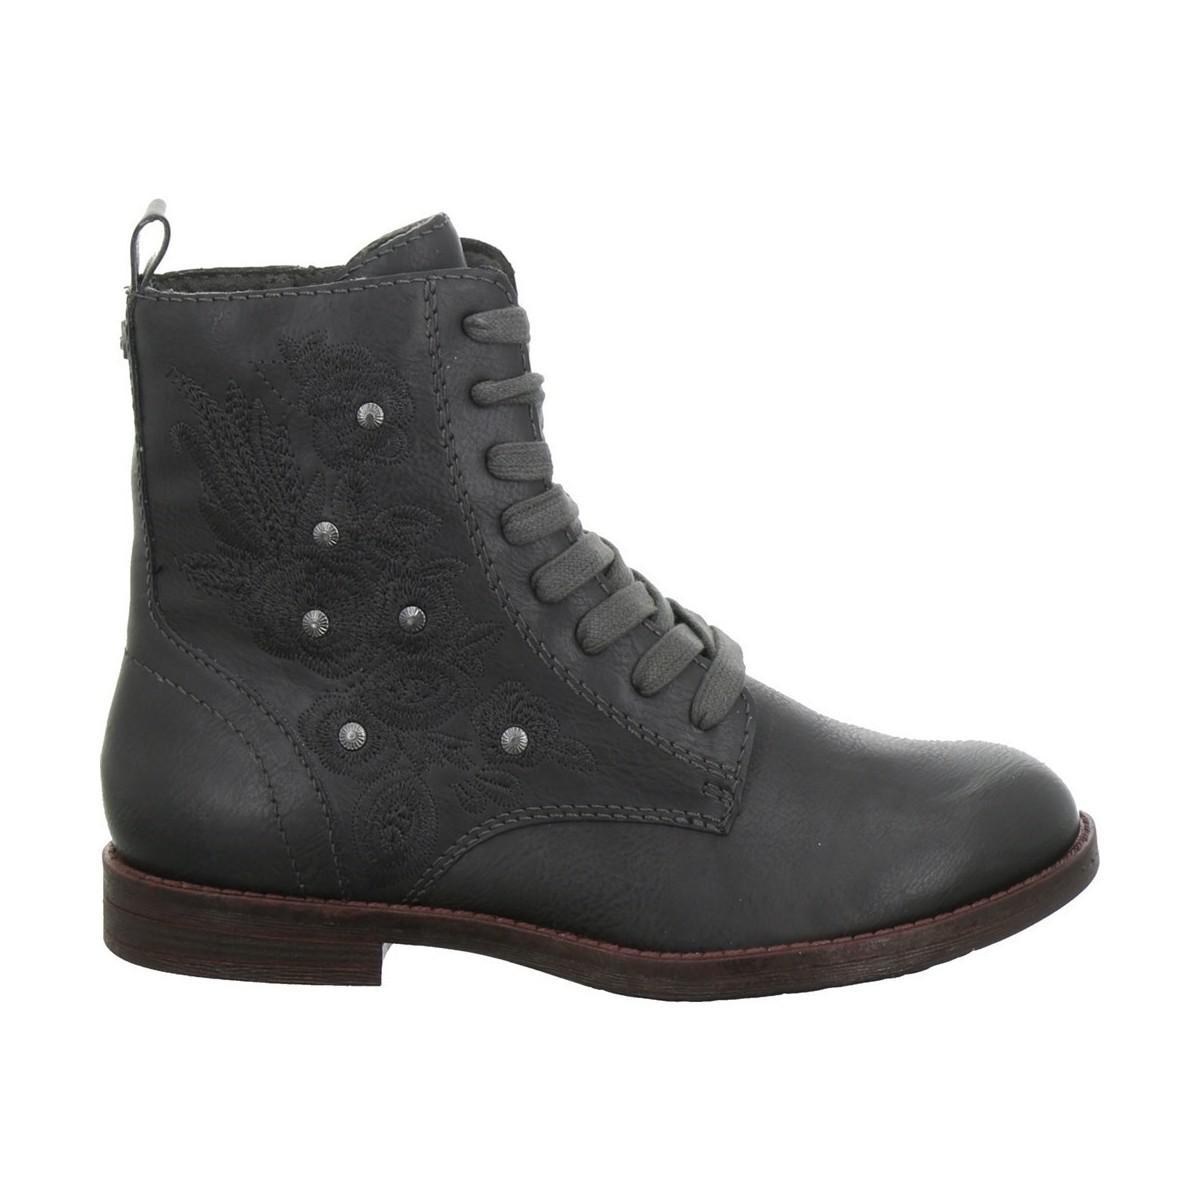 Boots Lyst Tamaris In Grey Women's Gray 112511421214 Mid gnnWtA